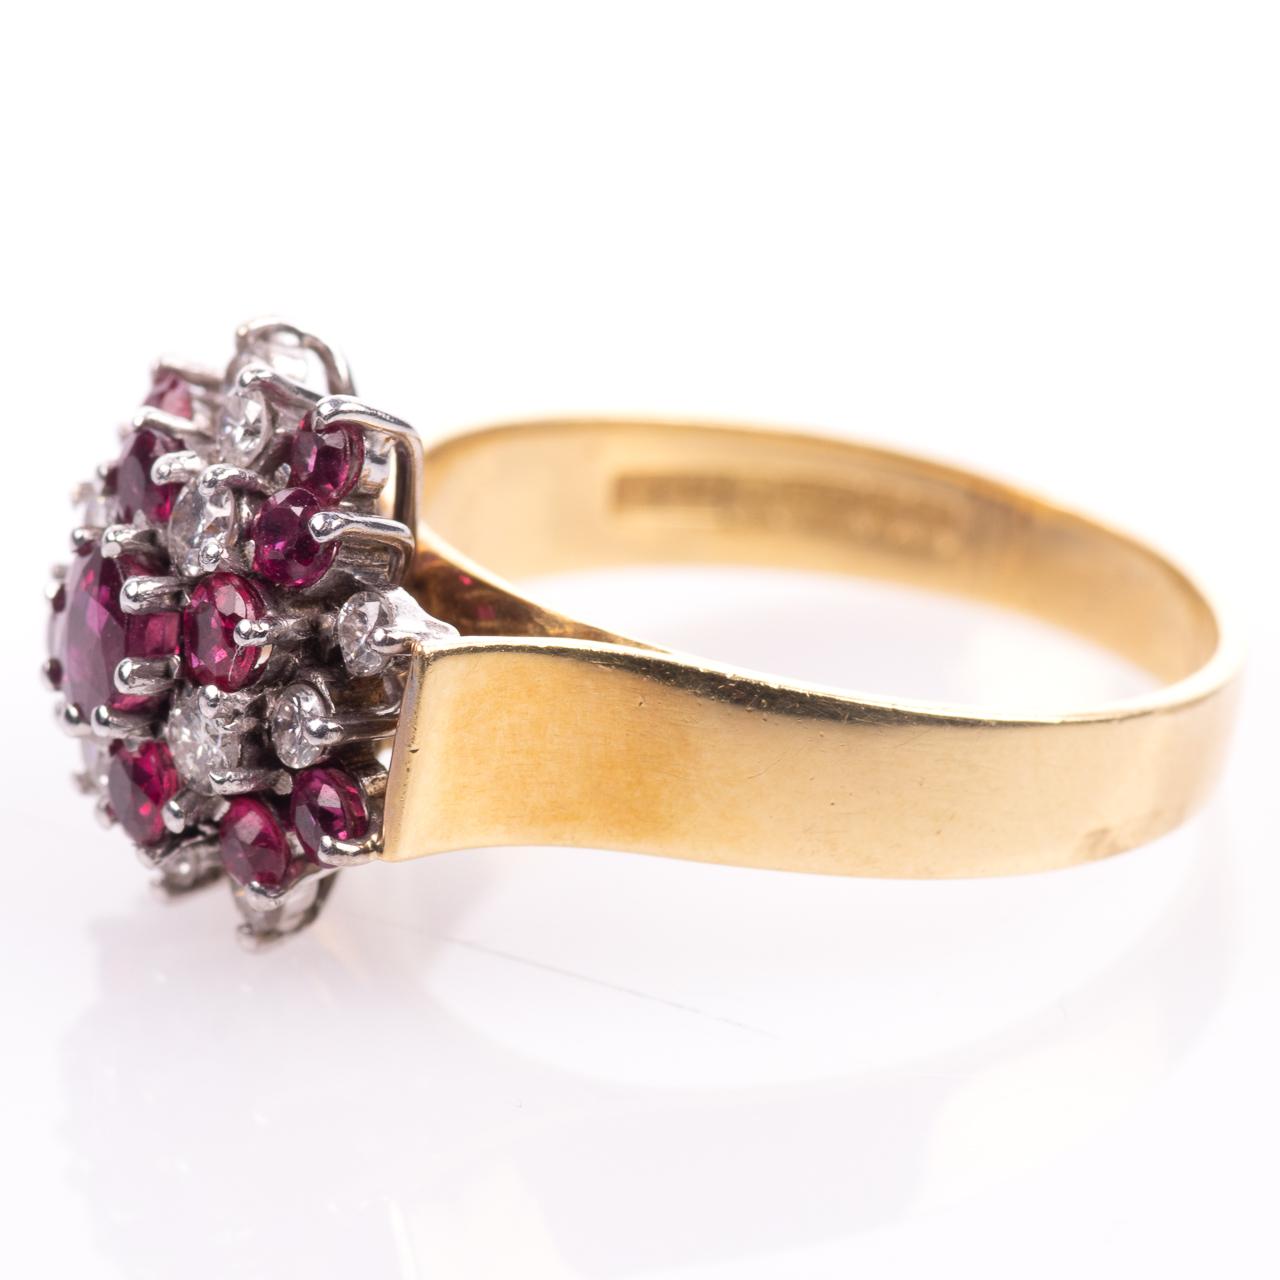 18ct Gold Ruby & 0.35ct Diamond Cluster Ring Hallmarked Birmingham - Image 4 of 7